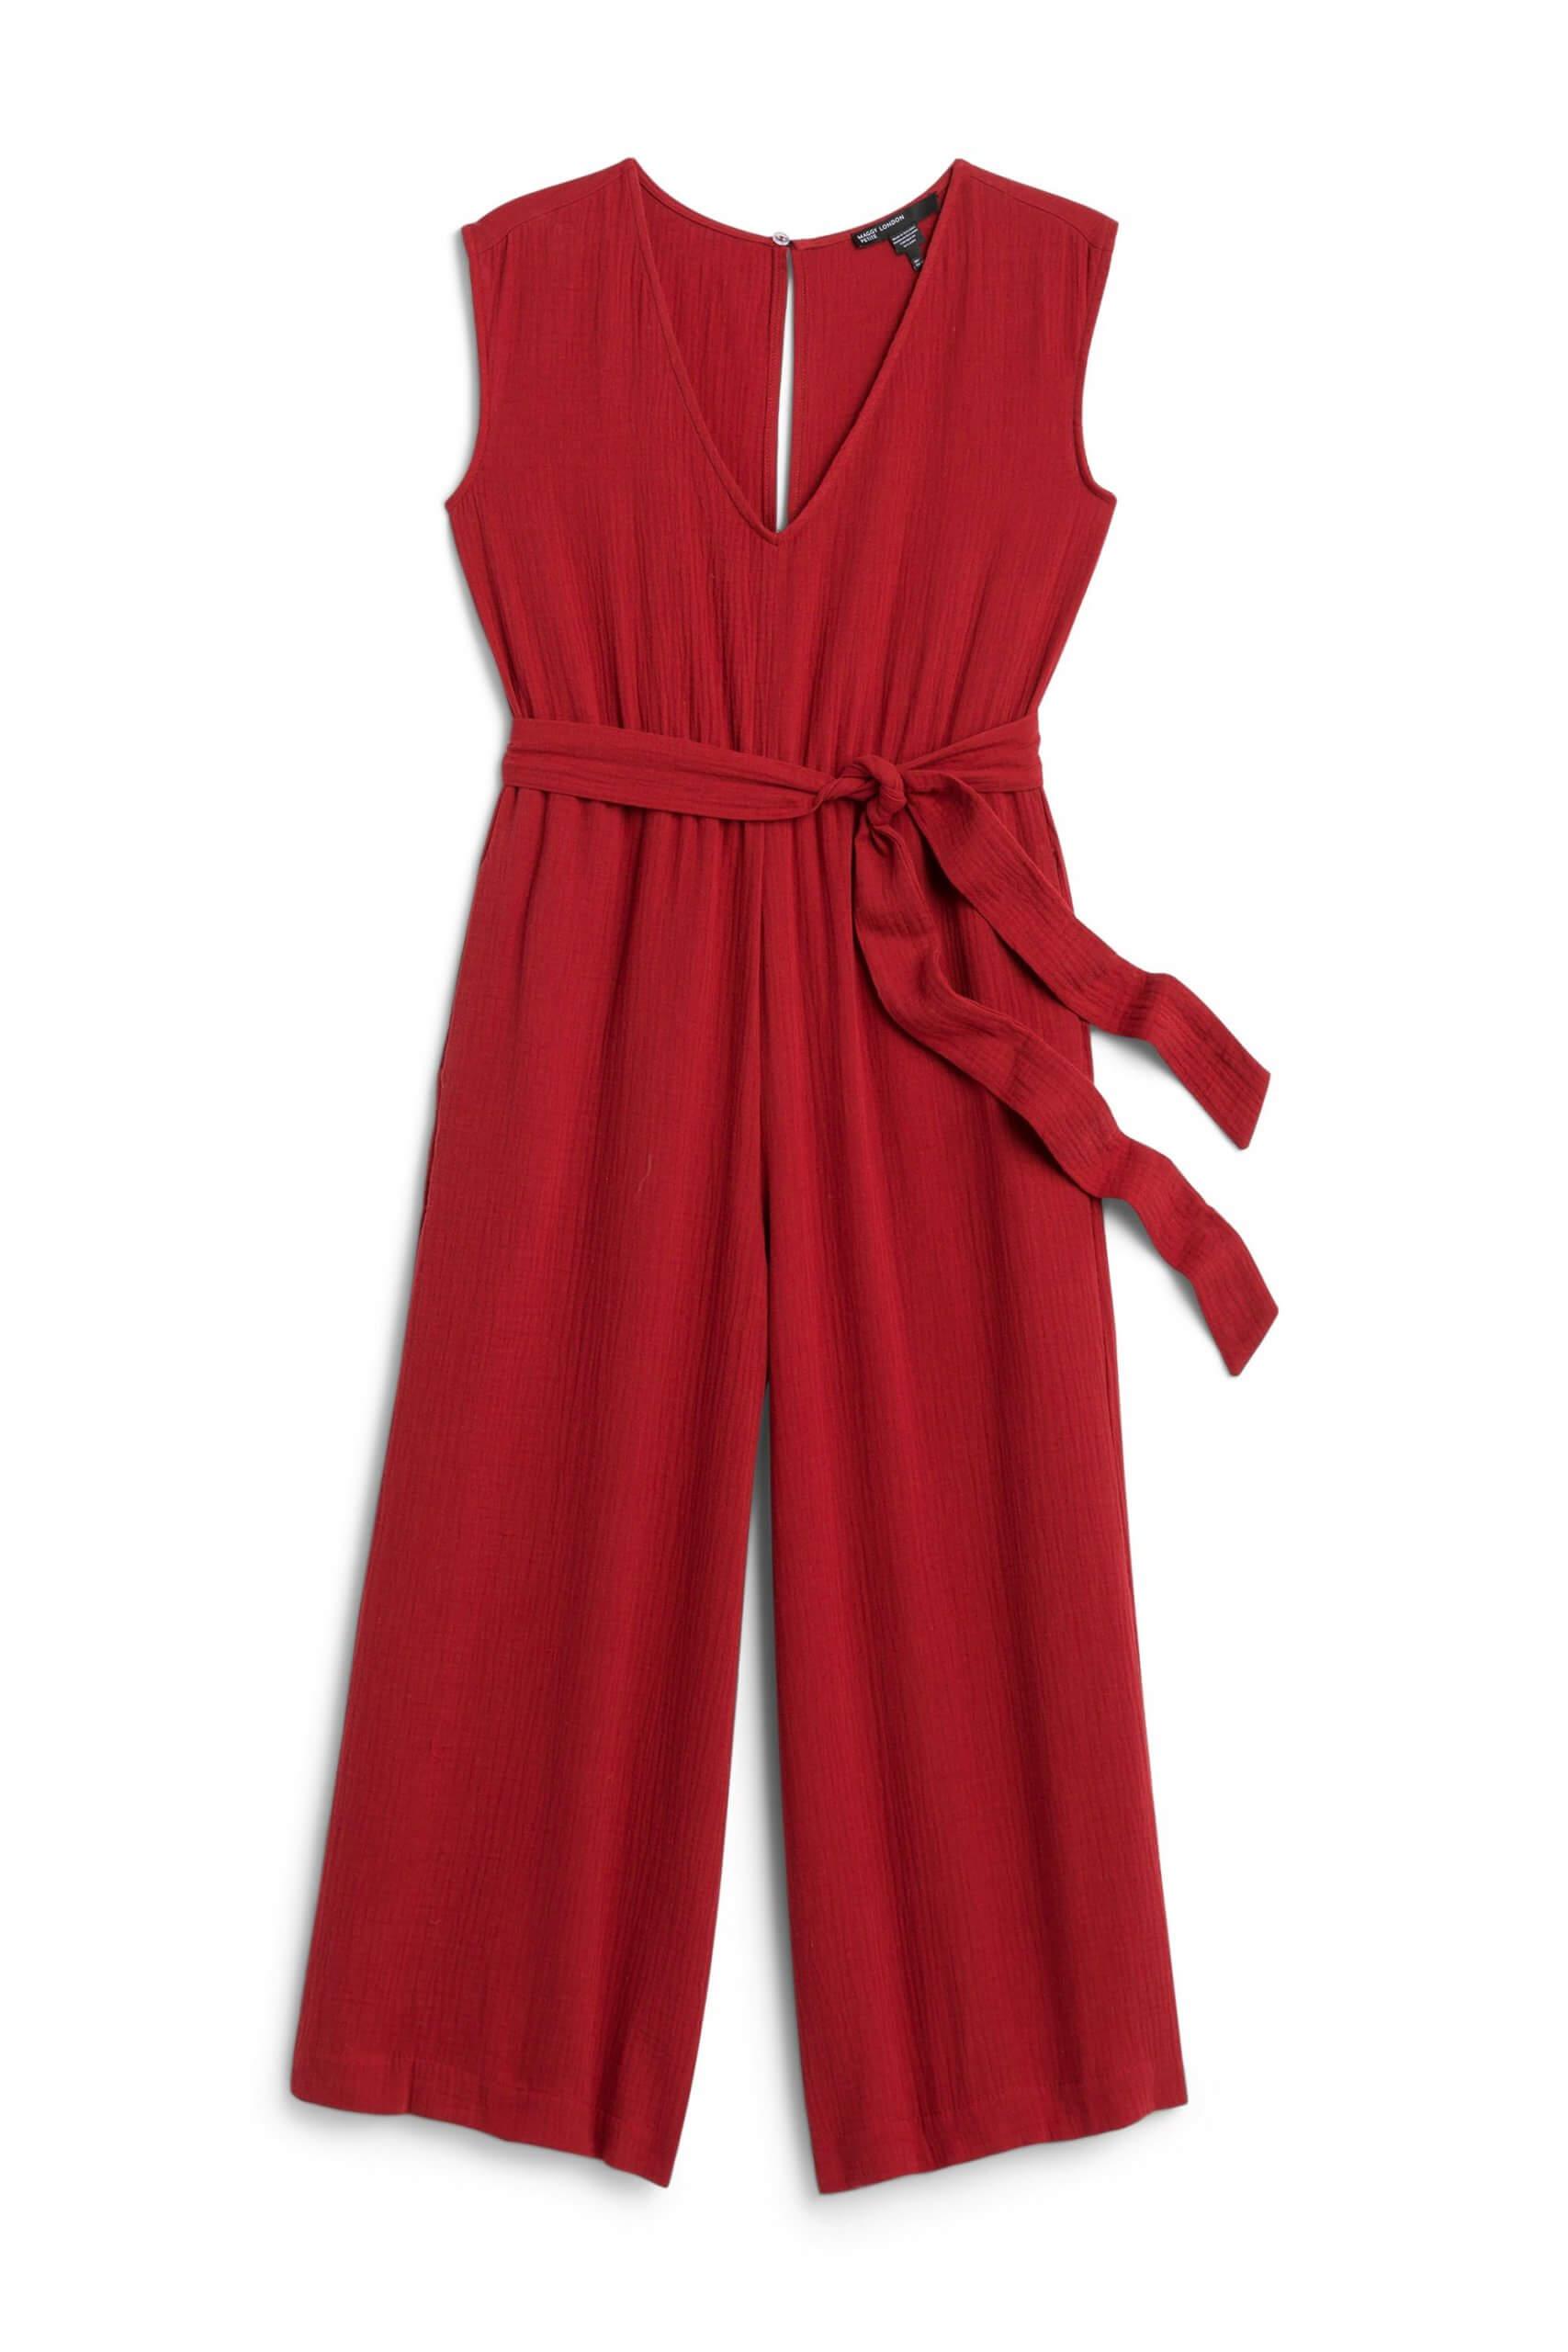 Stitch Fix Women's red jumpsuit.